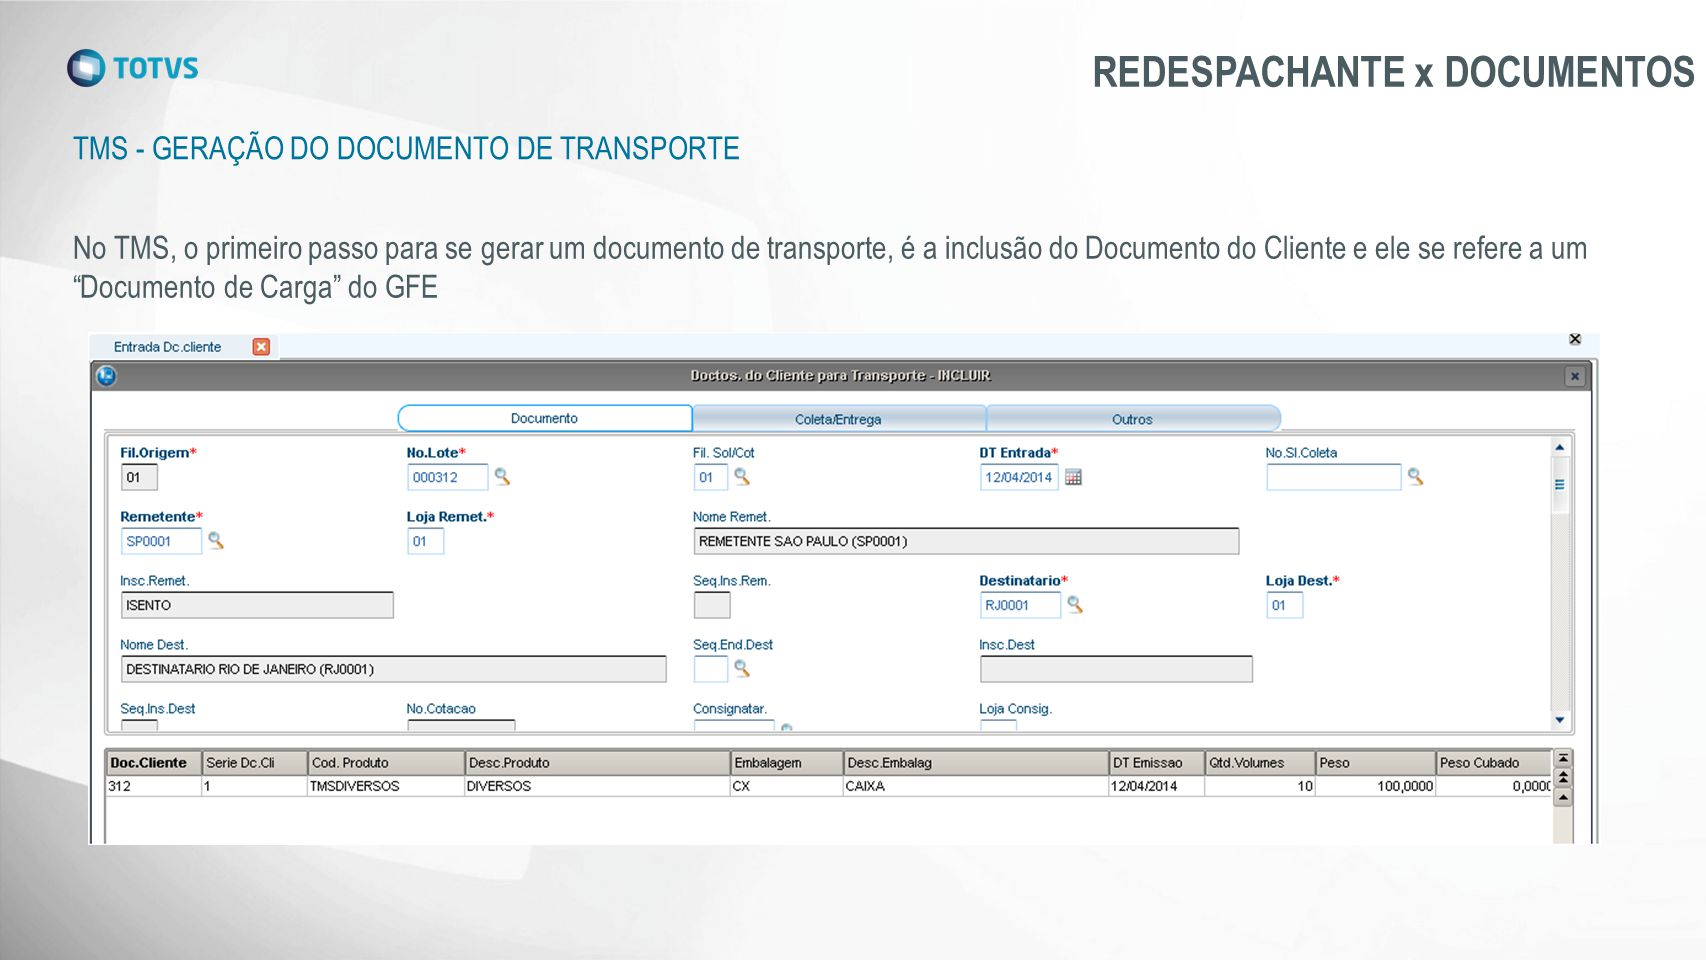 REDESPACHANTE x DOCUMENTOS